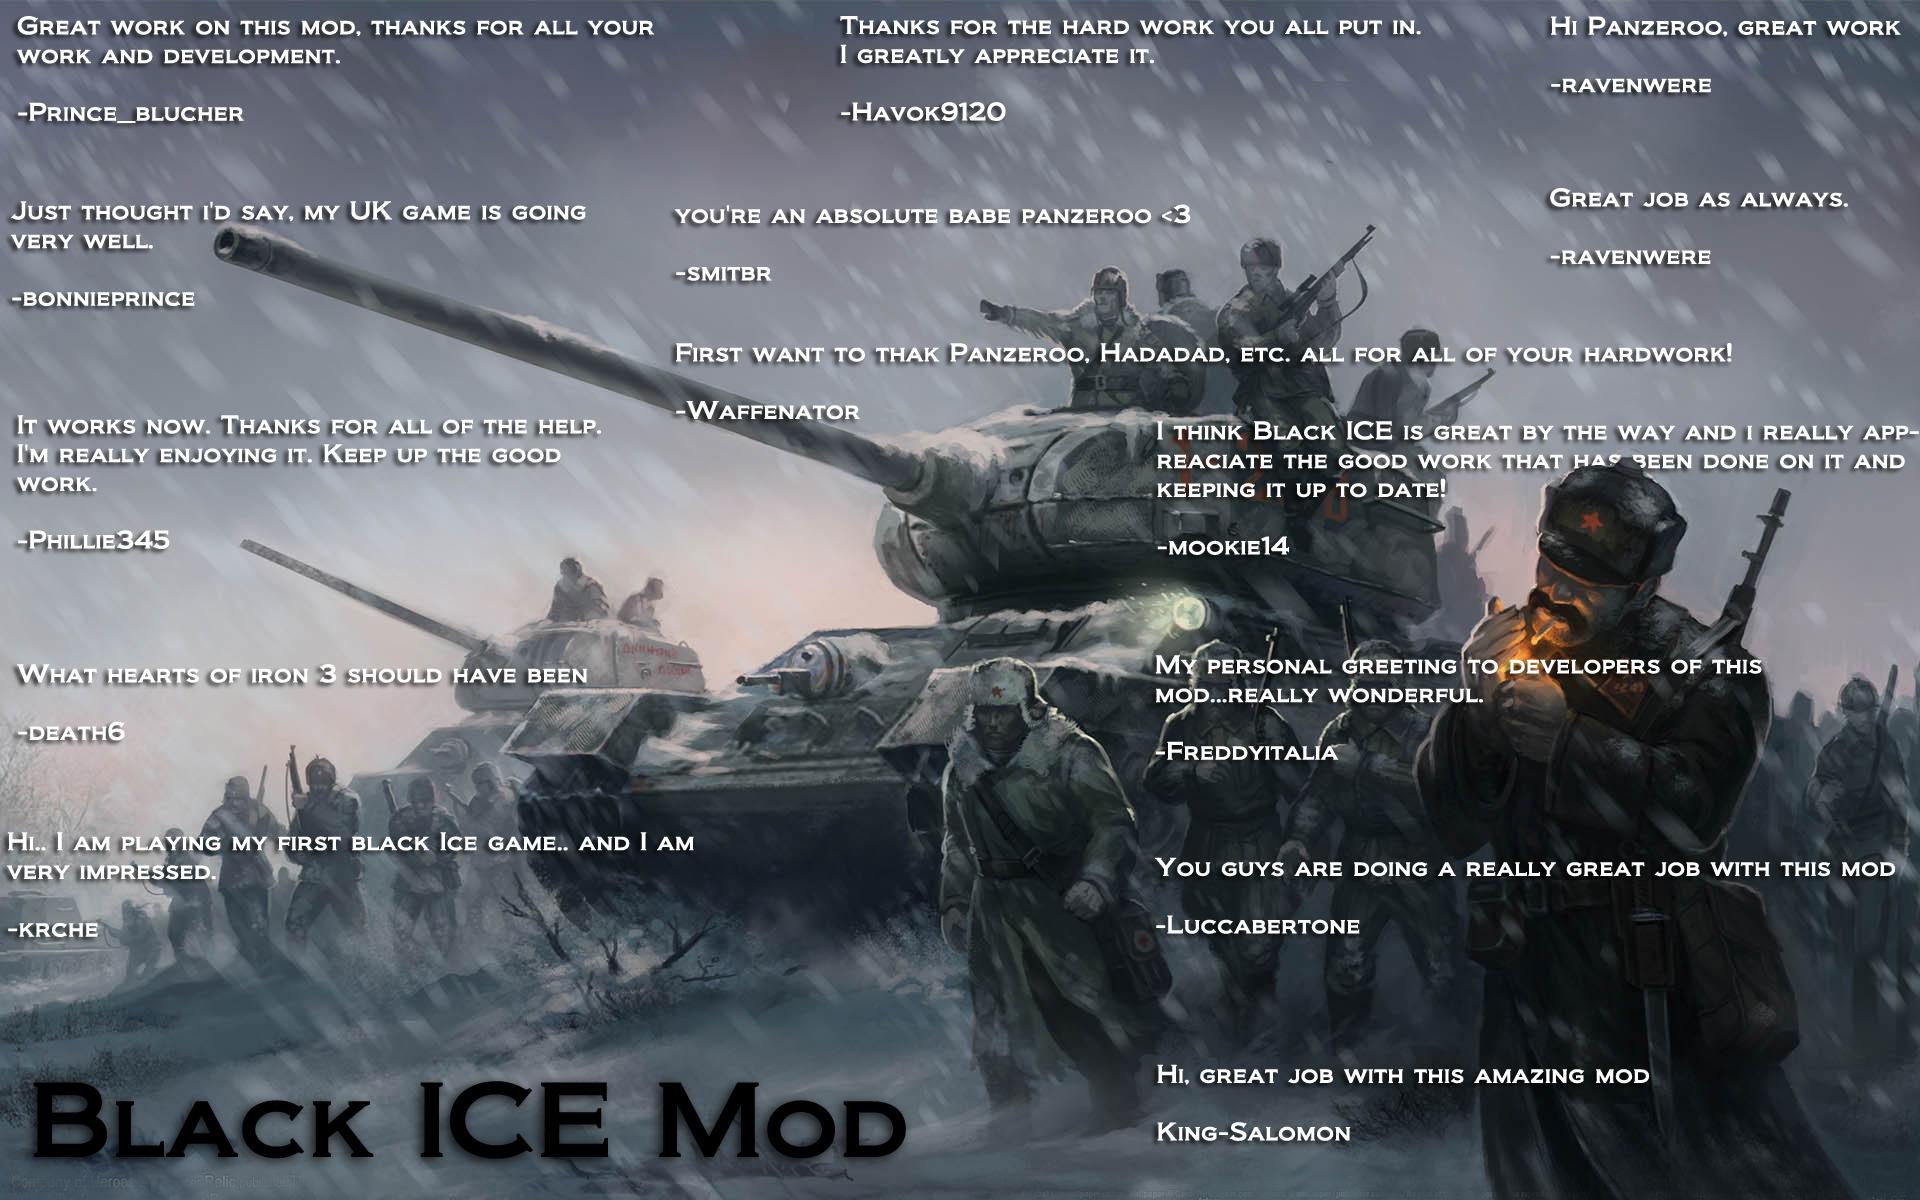 Black ICE MKVI Patch 931 Released news   Mod DB 1920x1200